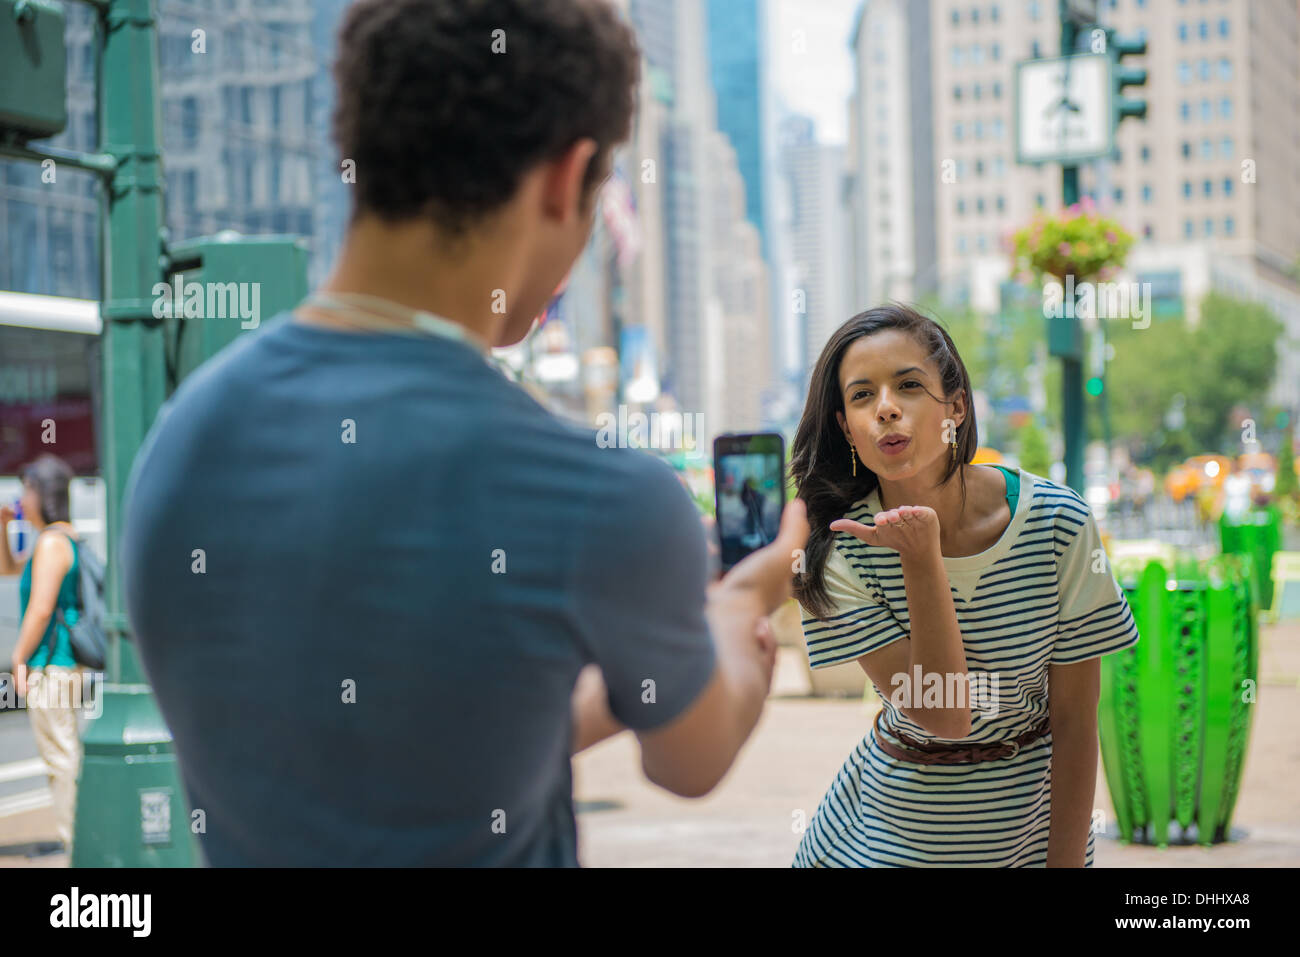 Woman blowing kiss - Stock Image